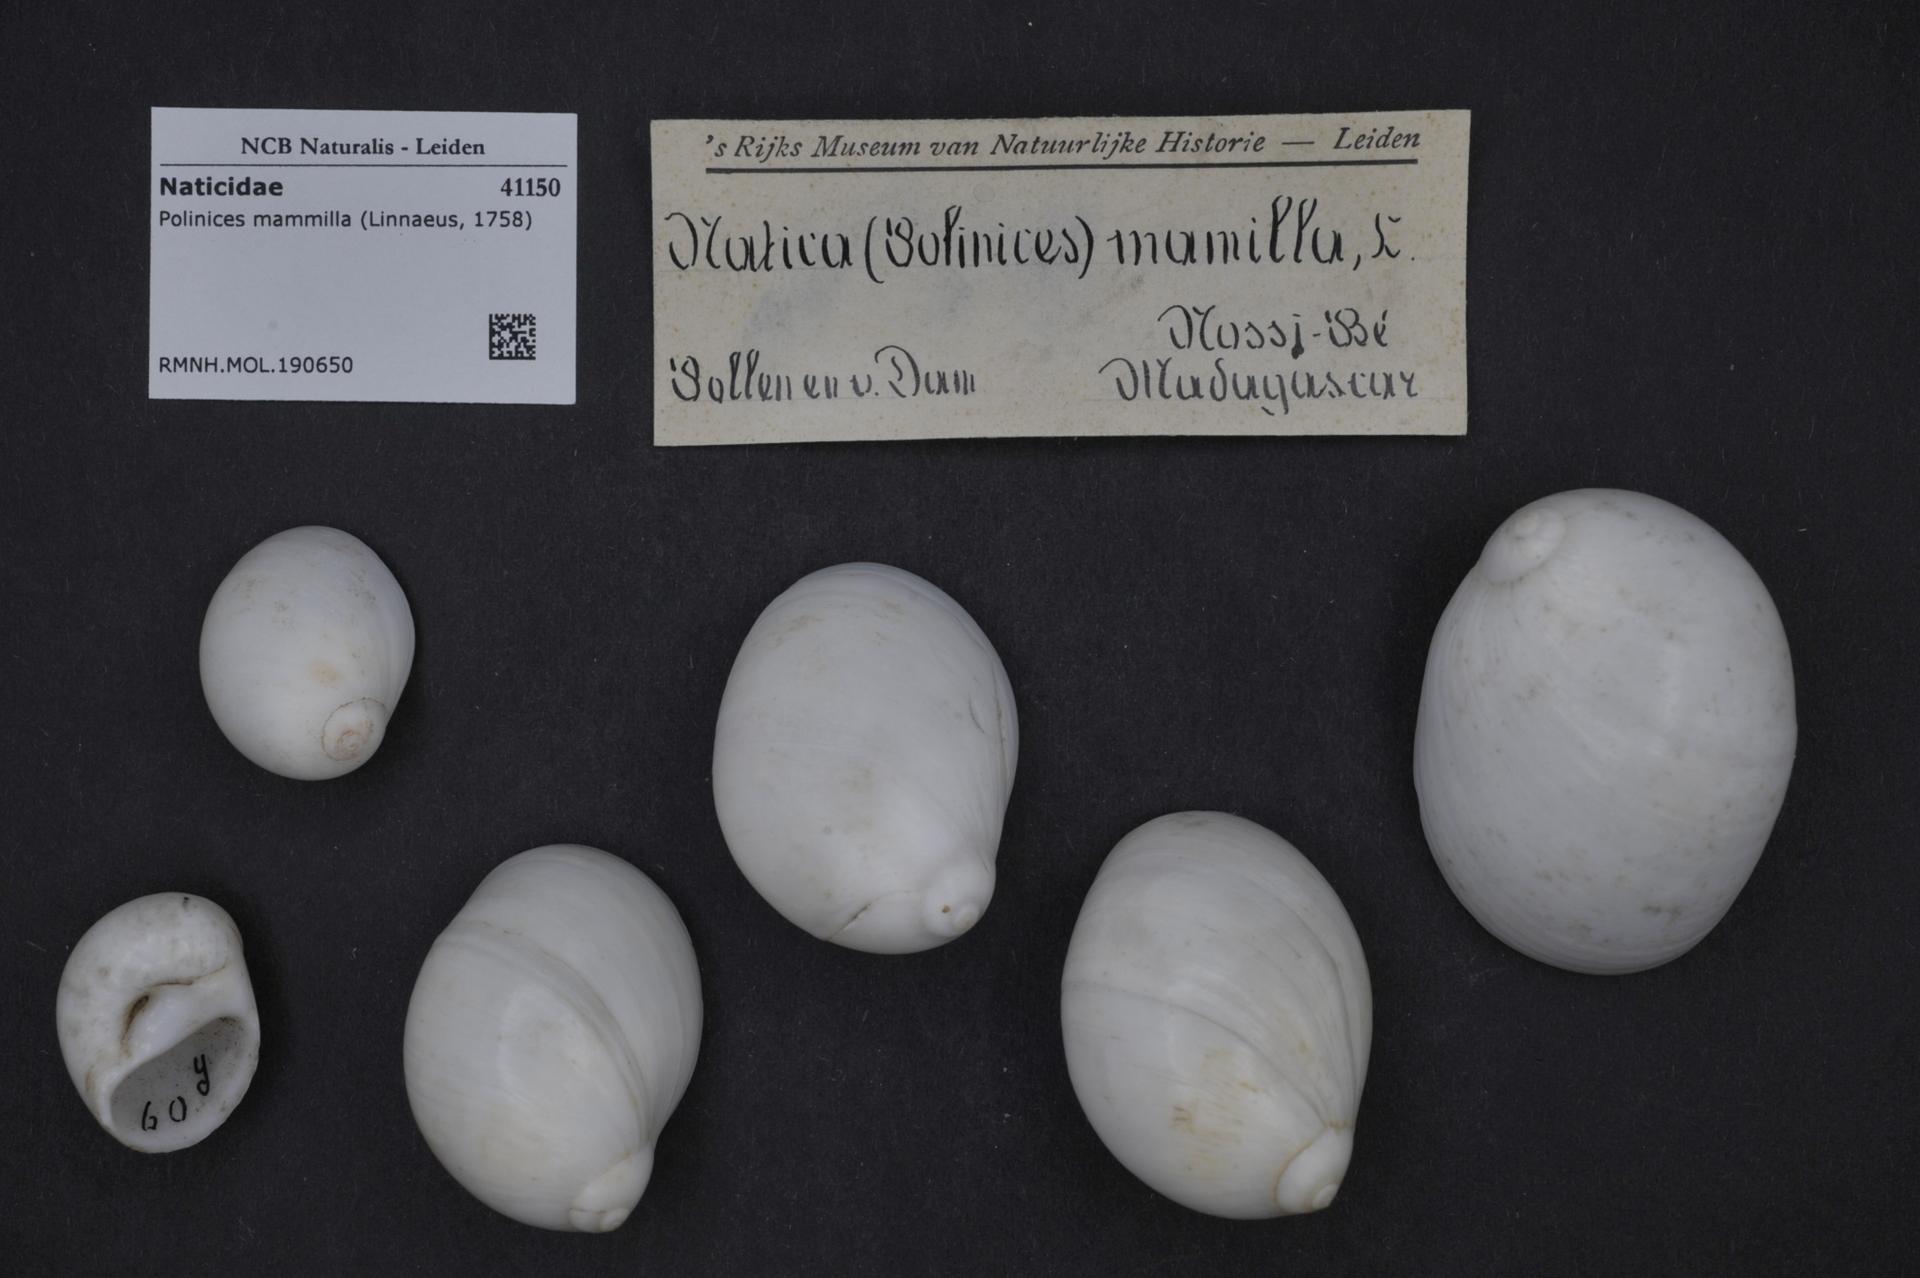 RMNH.MOL.190650 | Polinices mammilla (Linnaeus, 1758)